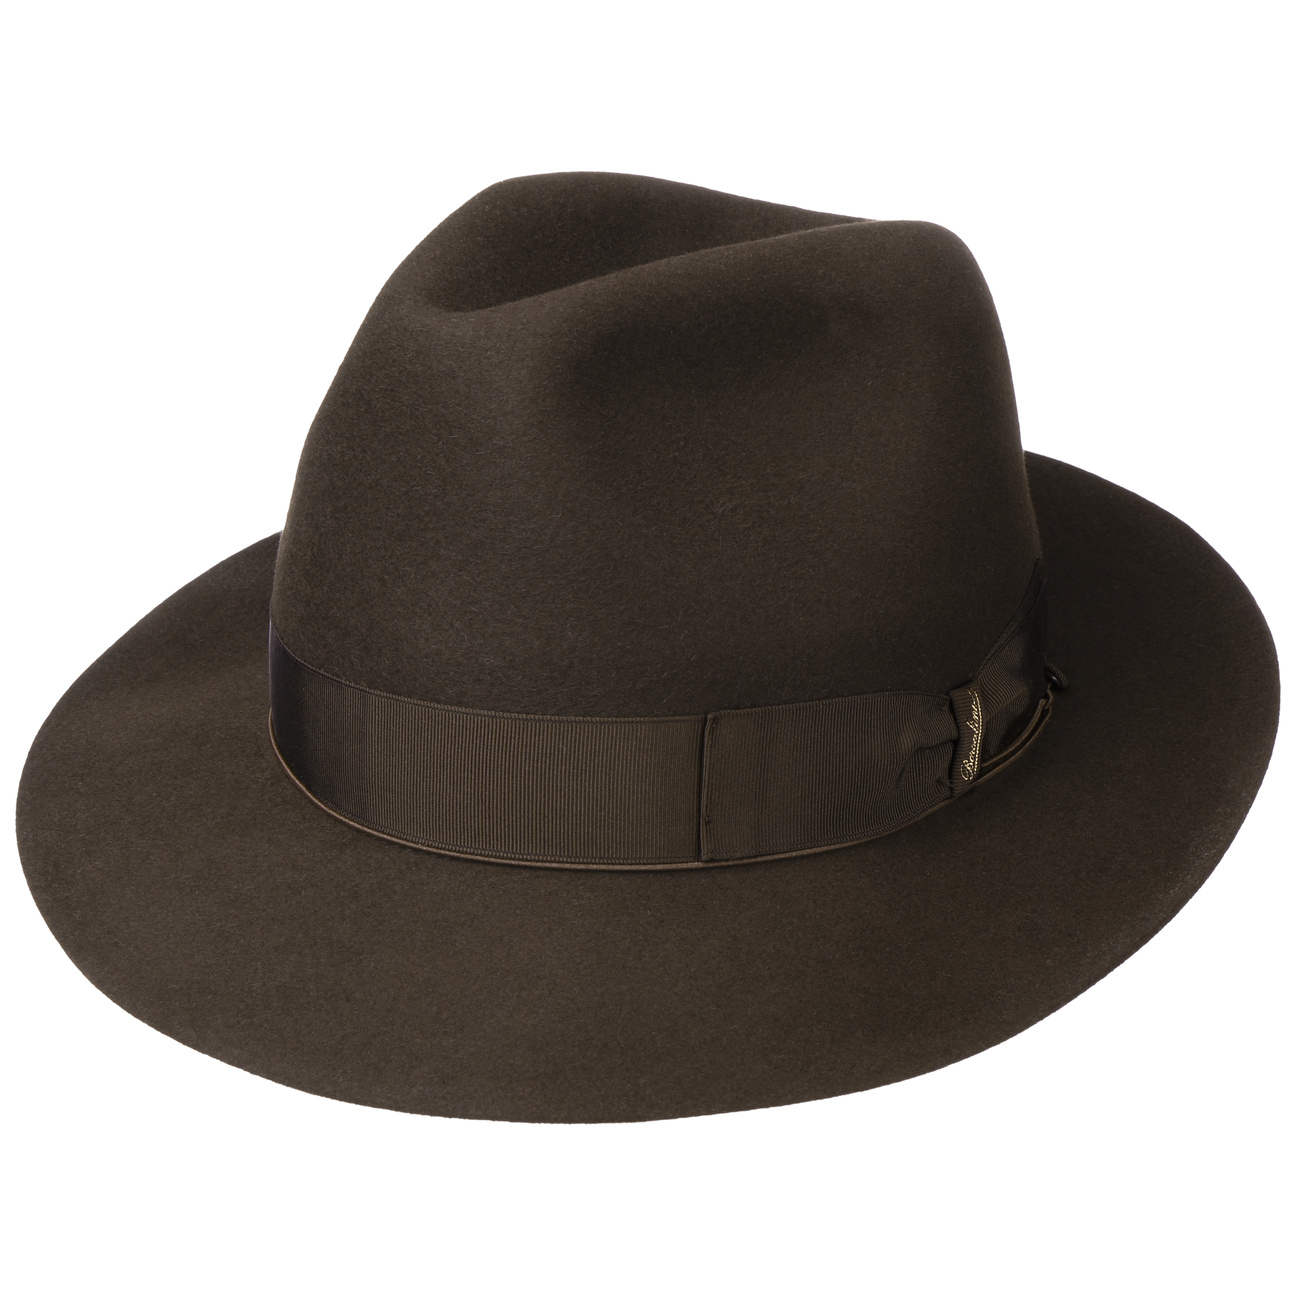 Sombrero Borsalino Marrone  sombrero de pelo de lapin